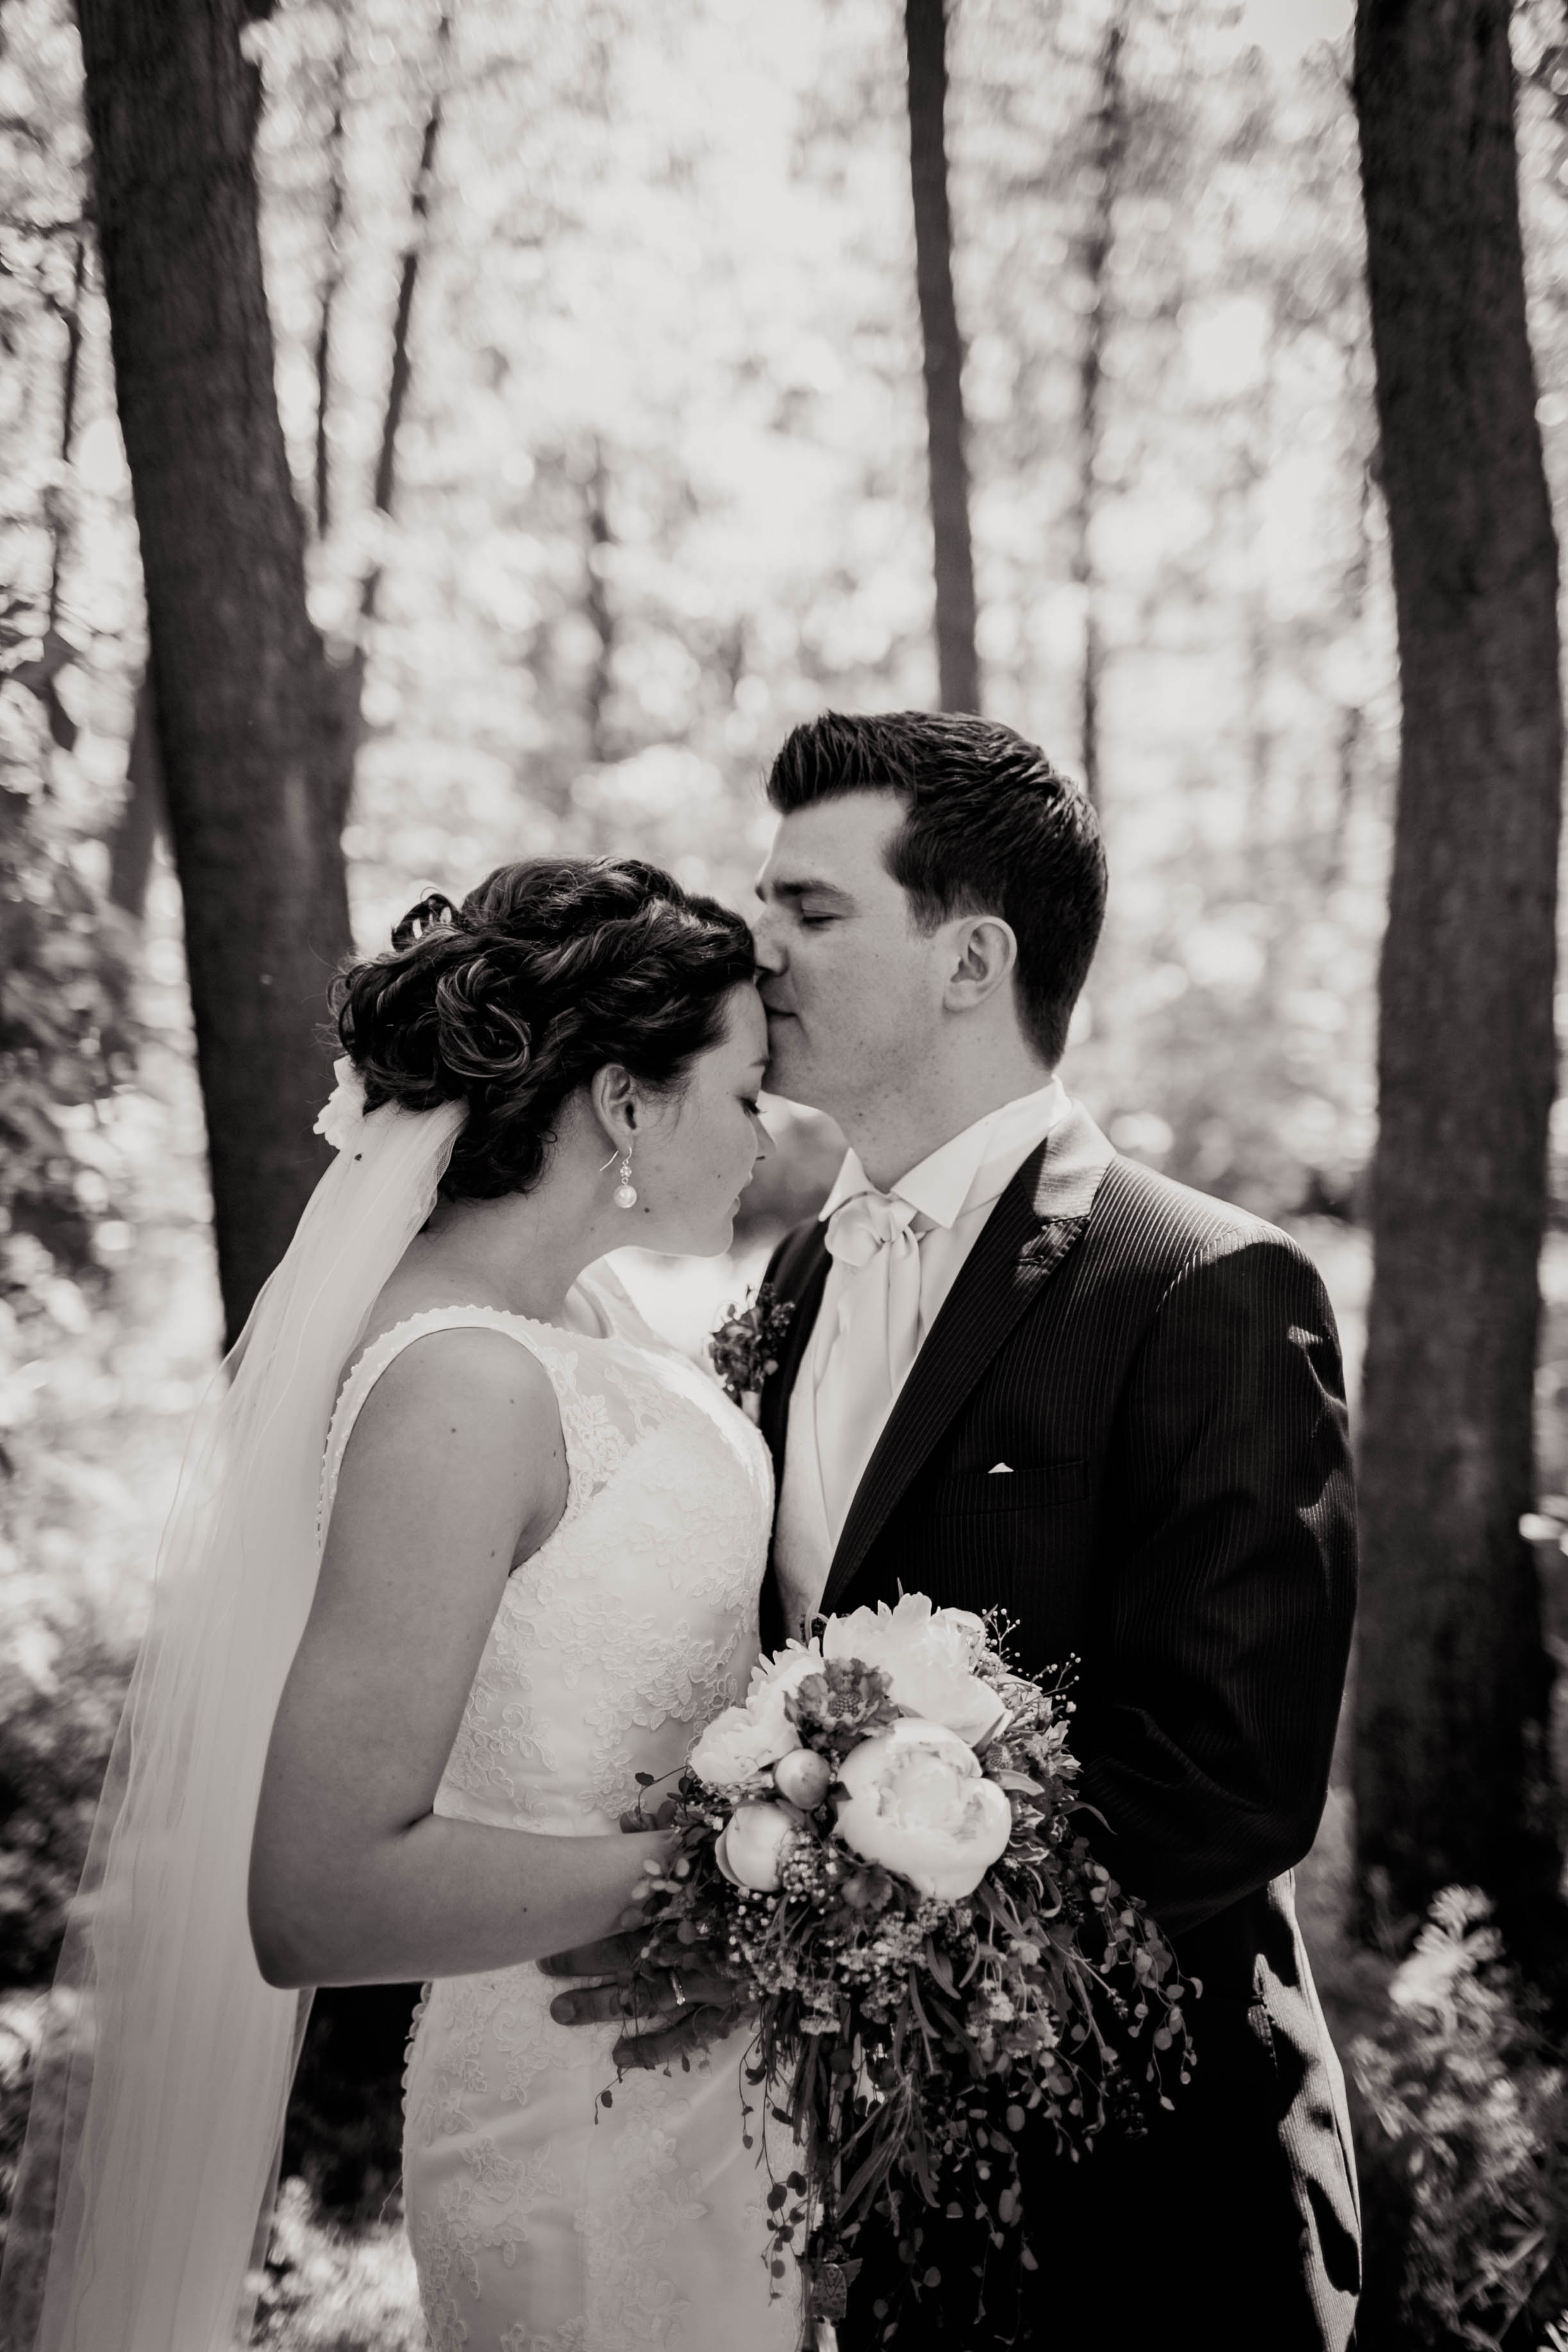 Hochzeitsfotografie Berlin_Fran Burrows Fotografie-188.jpg